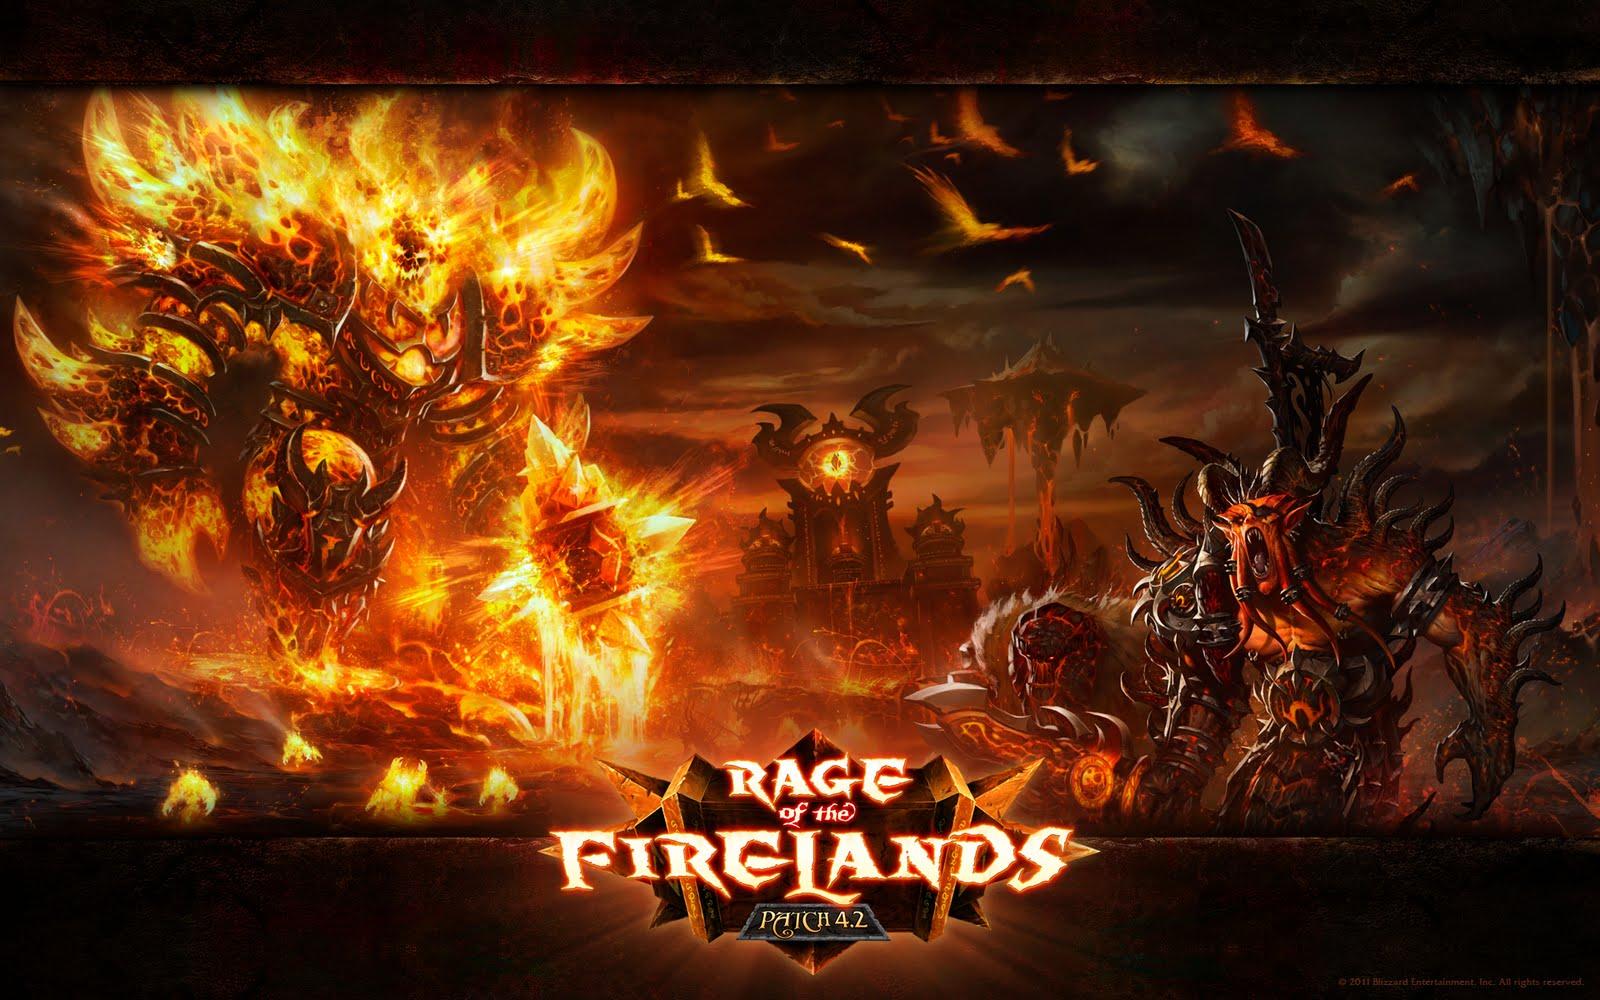 http://2.bp.blogspot.com/-S3cosgy5zZc/Tf7ajw_TMZI/AAAAAAAAACY/dkDlhP3GGdQ/s1600/rage-of-the-firelands-1920x1200.jpg